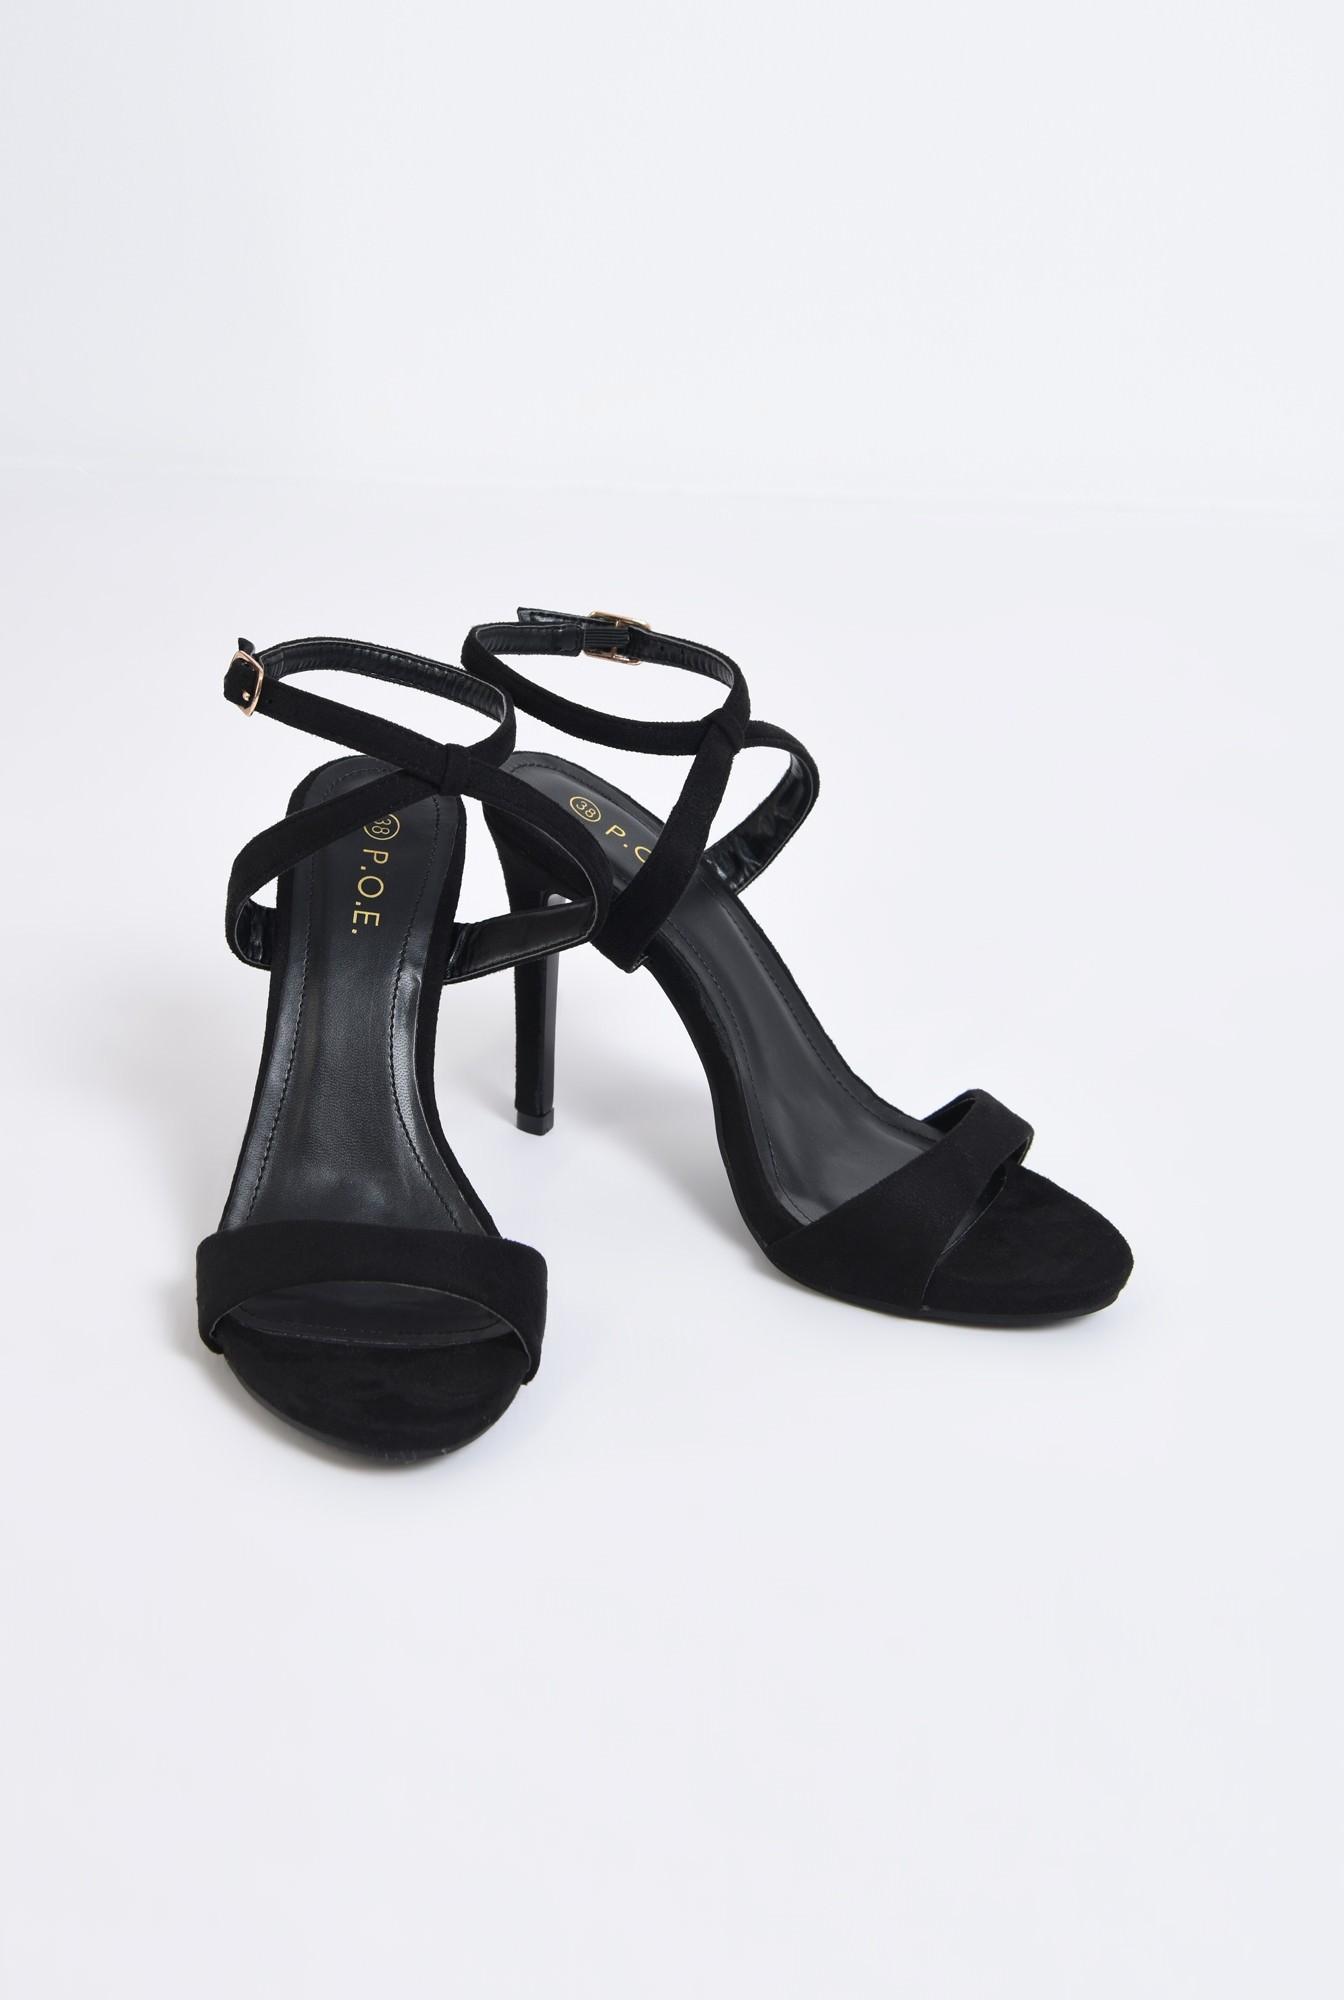 3 - sandale elegante, velur, negru, toc cui